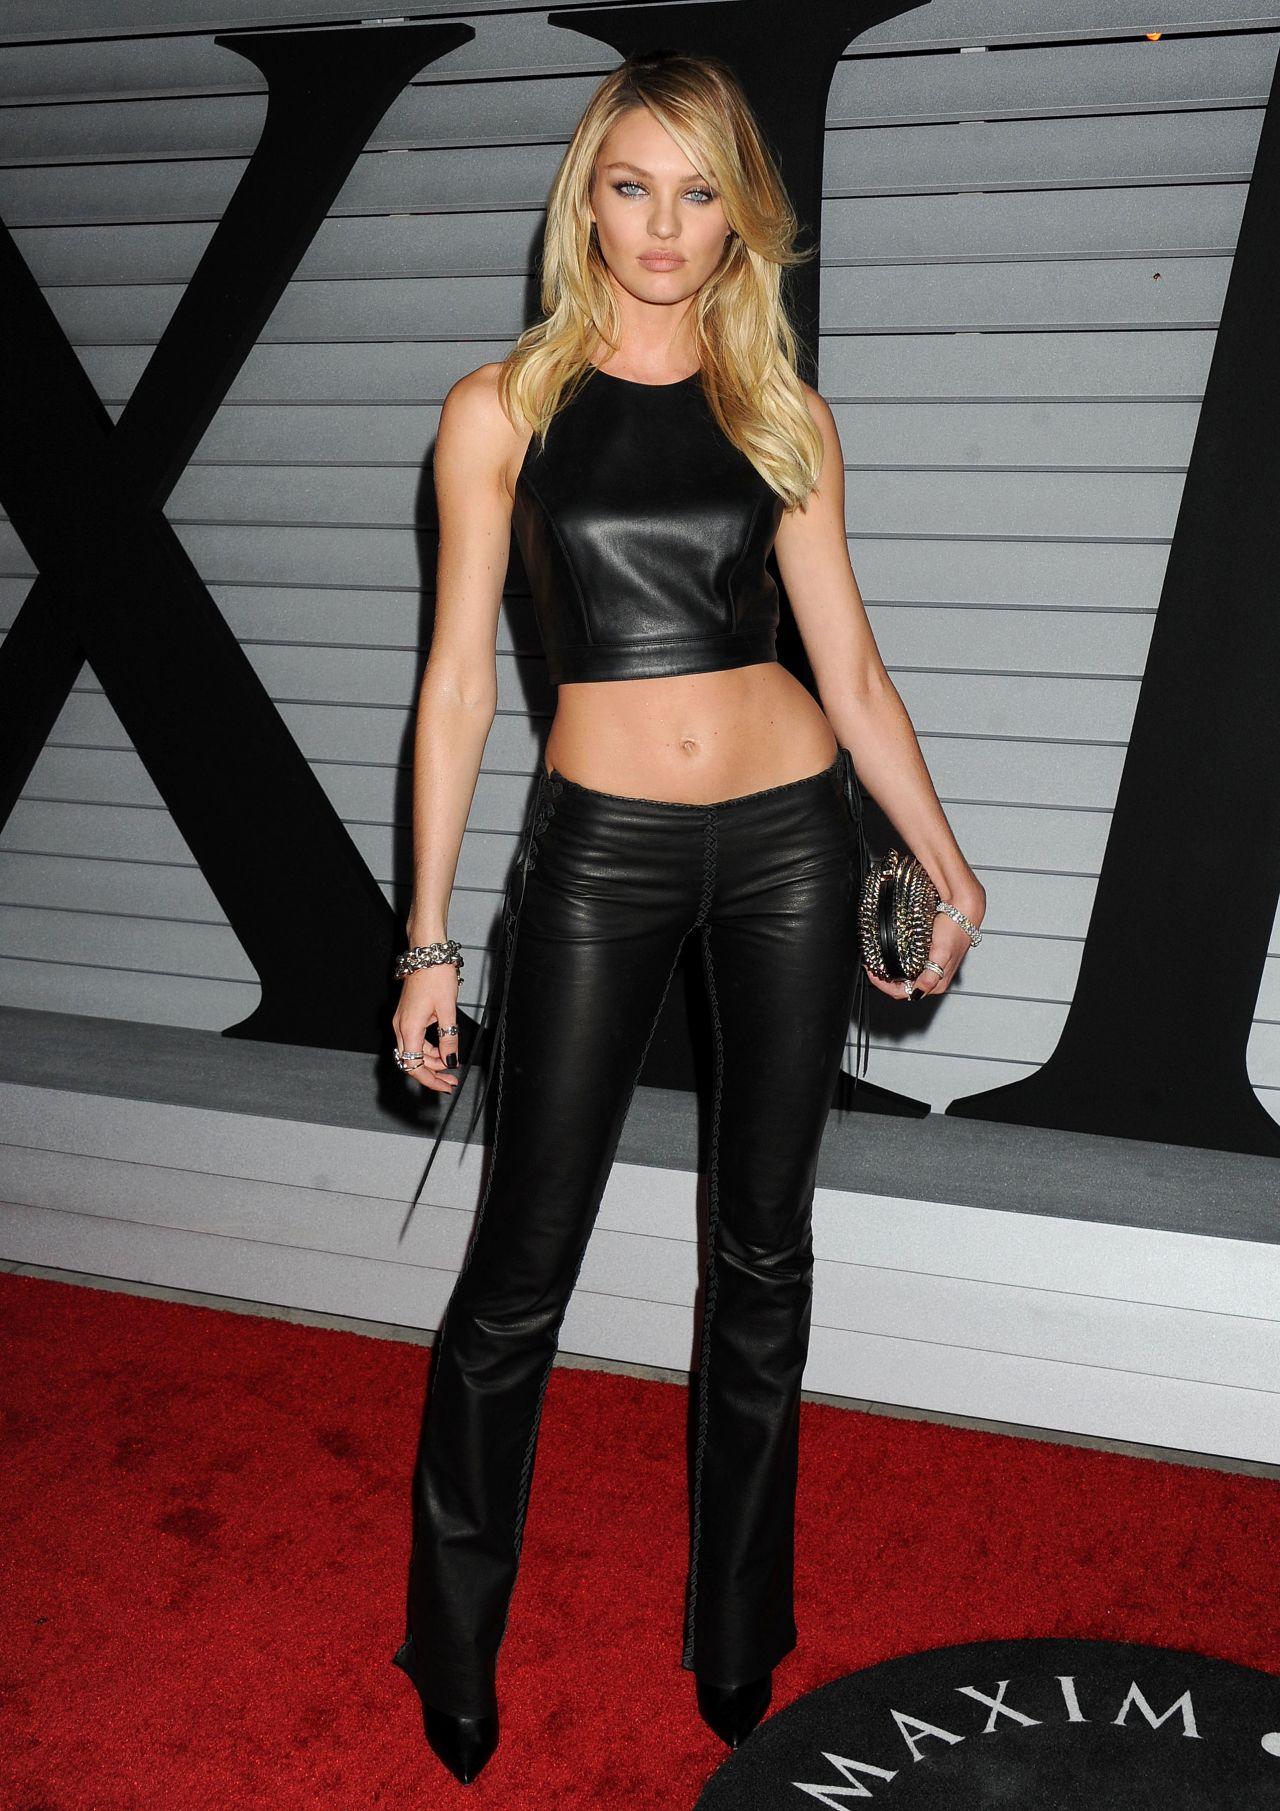 Hottest Woman 11 12 16 Maiara Walsh Notorious: Maxim's Hot 100 Women Of 2014